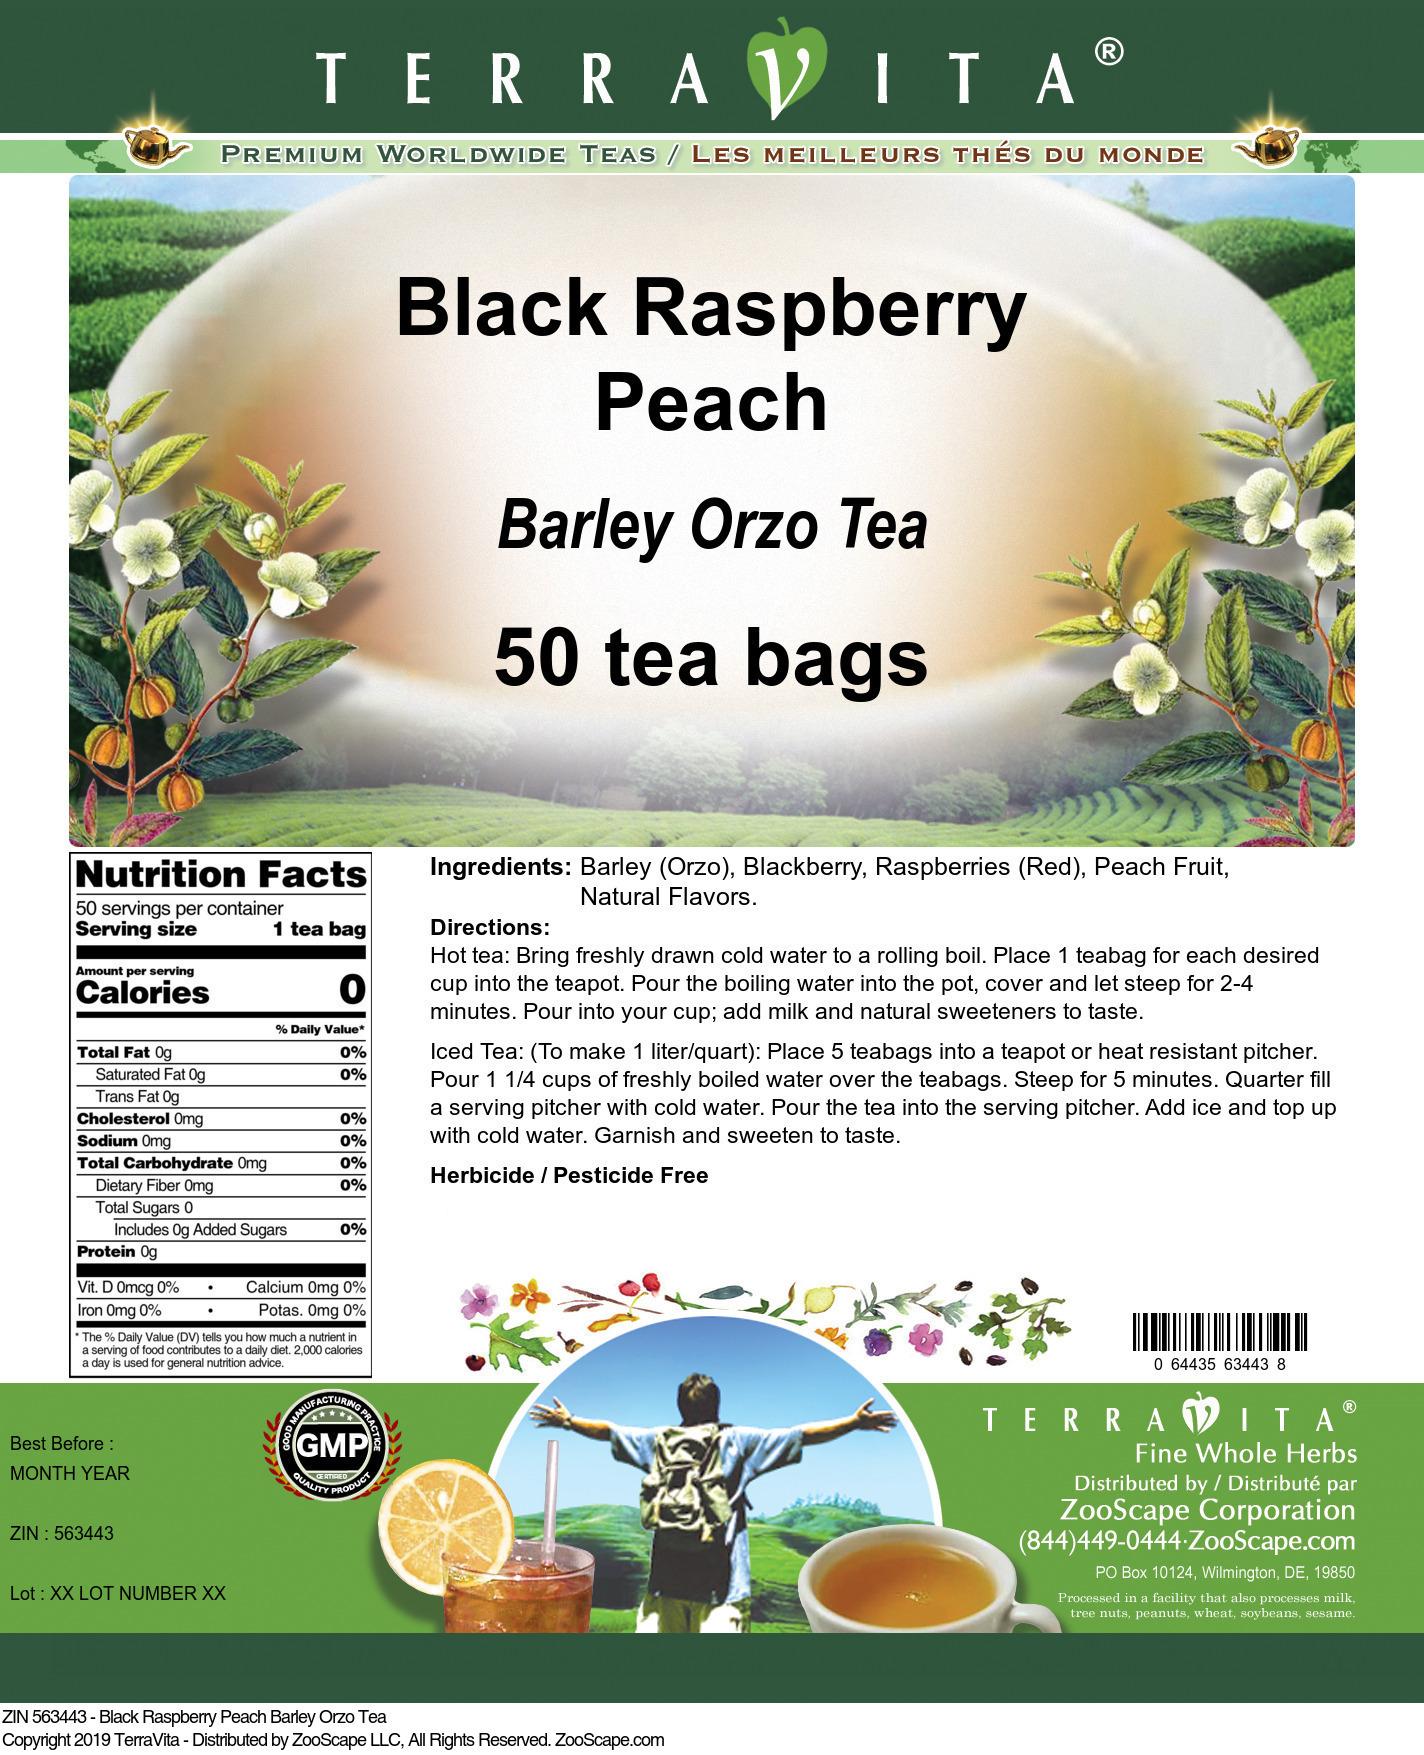 Black Raspberry Peach Barley Orzo